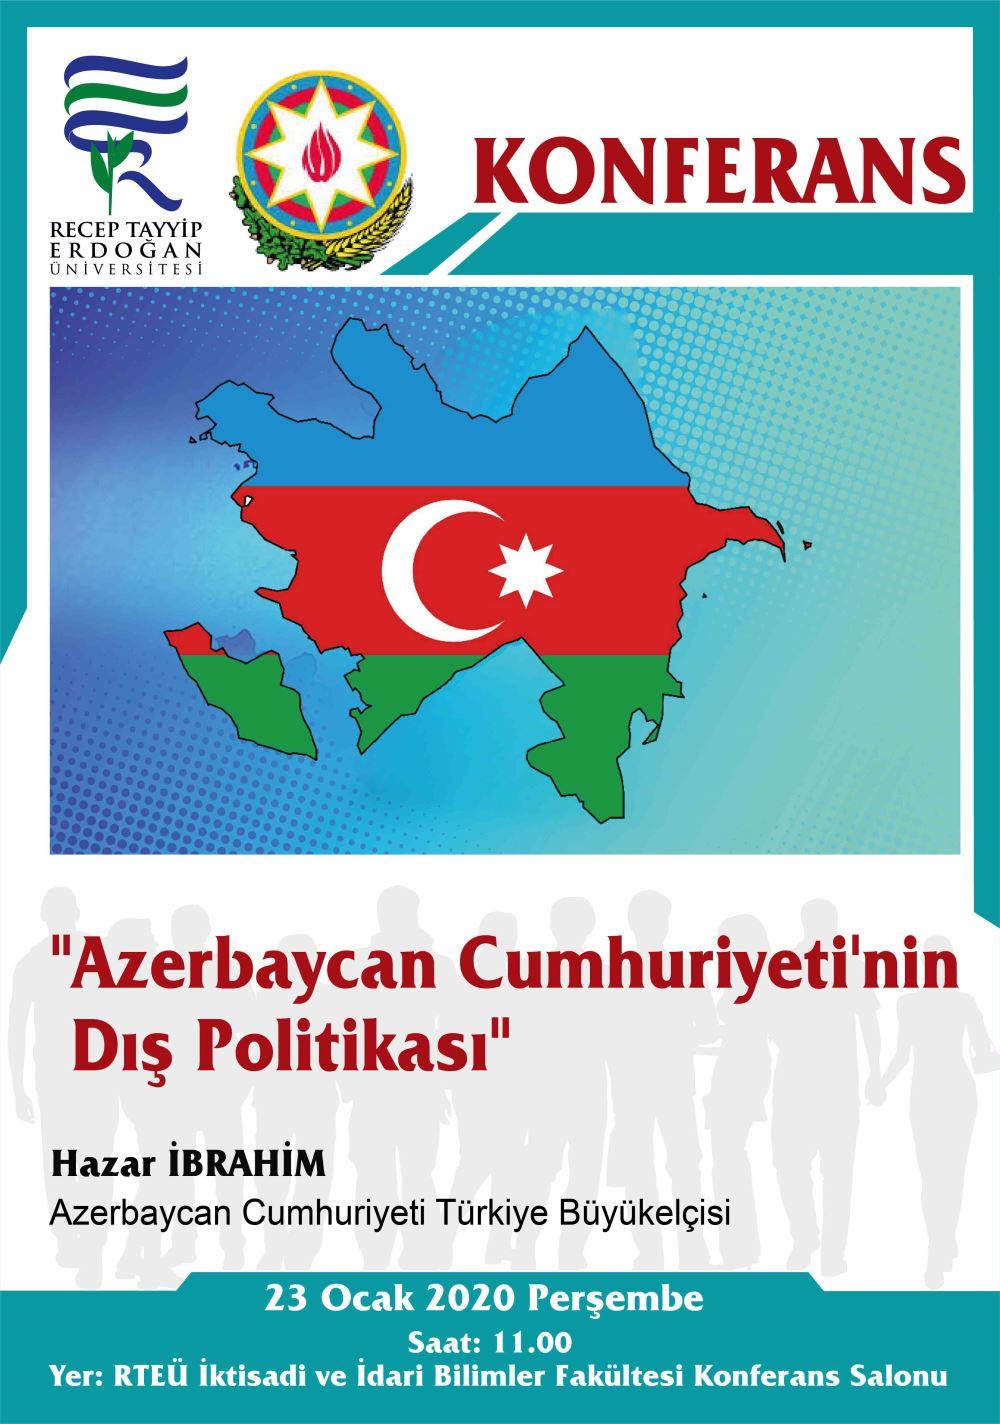 Azerbaycan Cumhuriyeti 'nin Dış Politikası